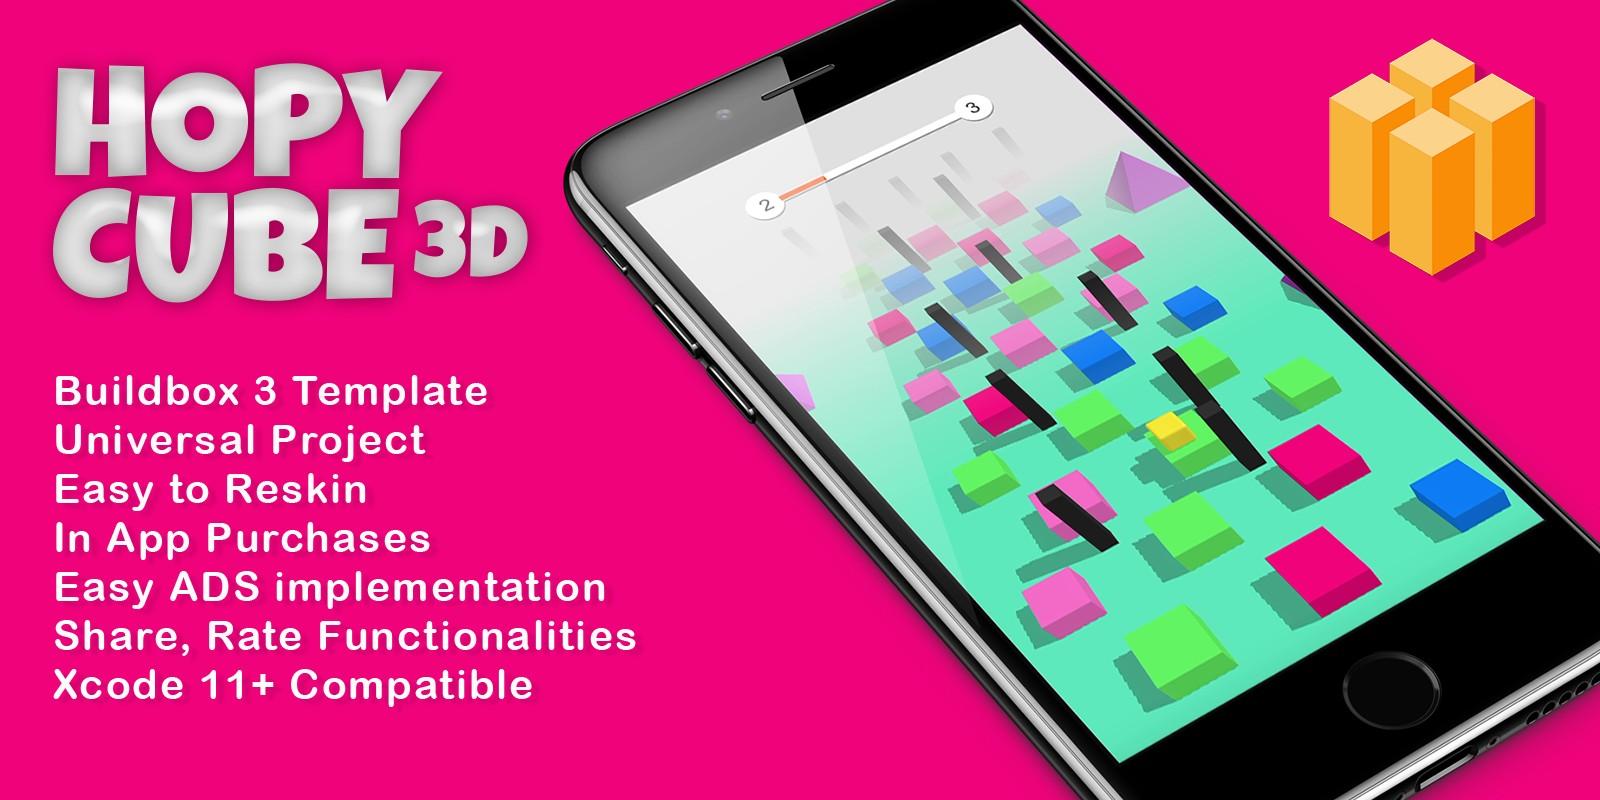 HopyCube 3D - Buildbox Template